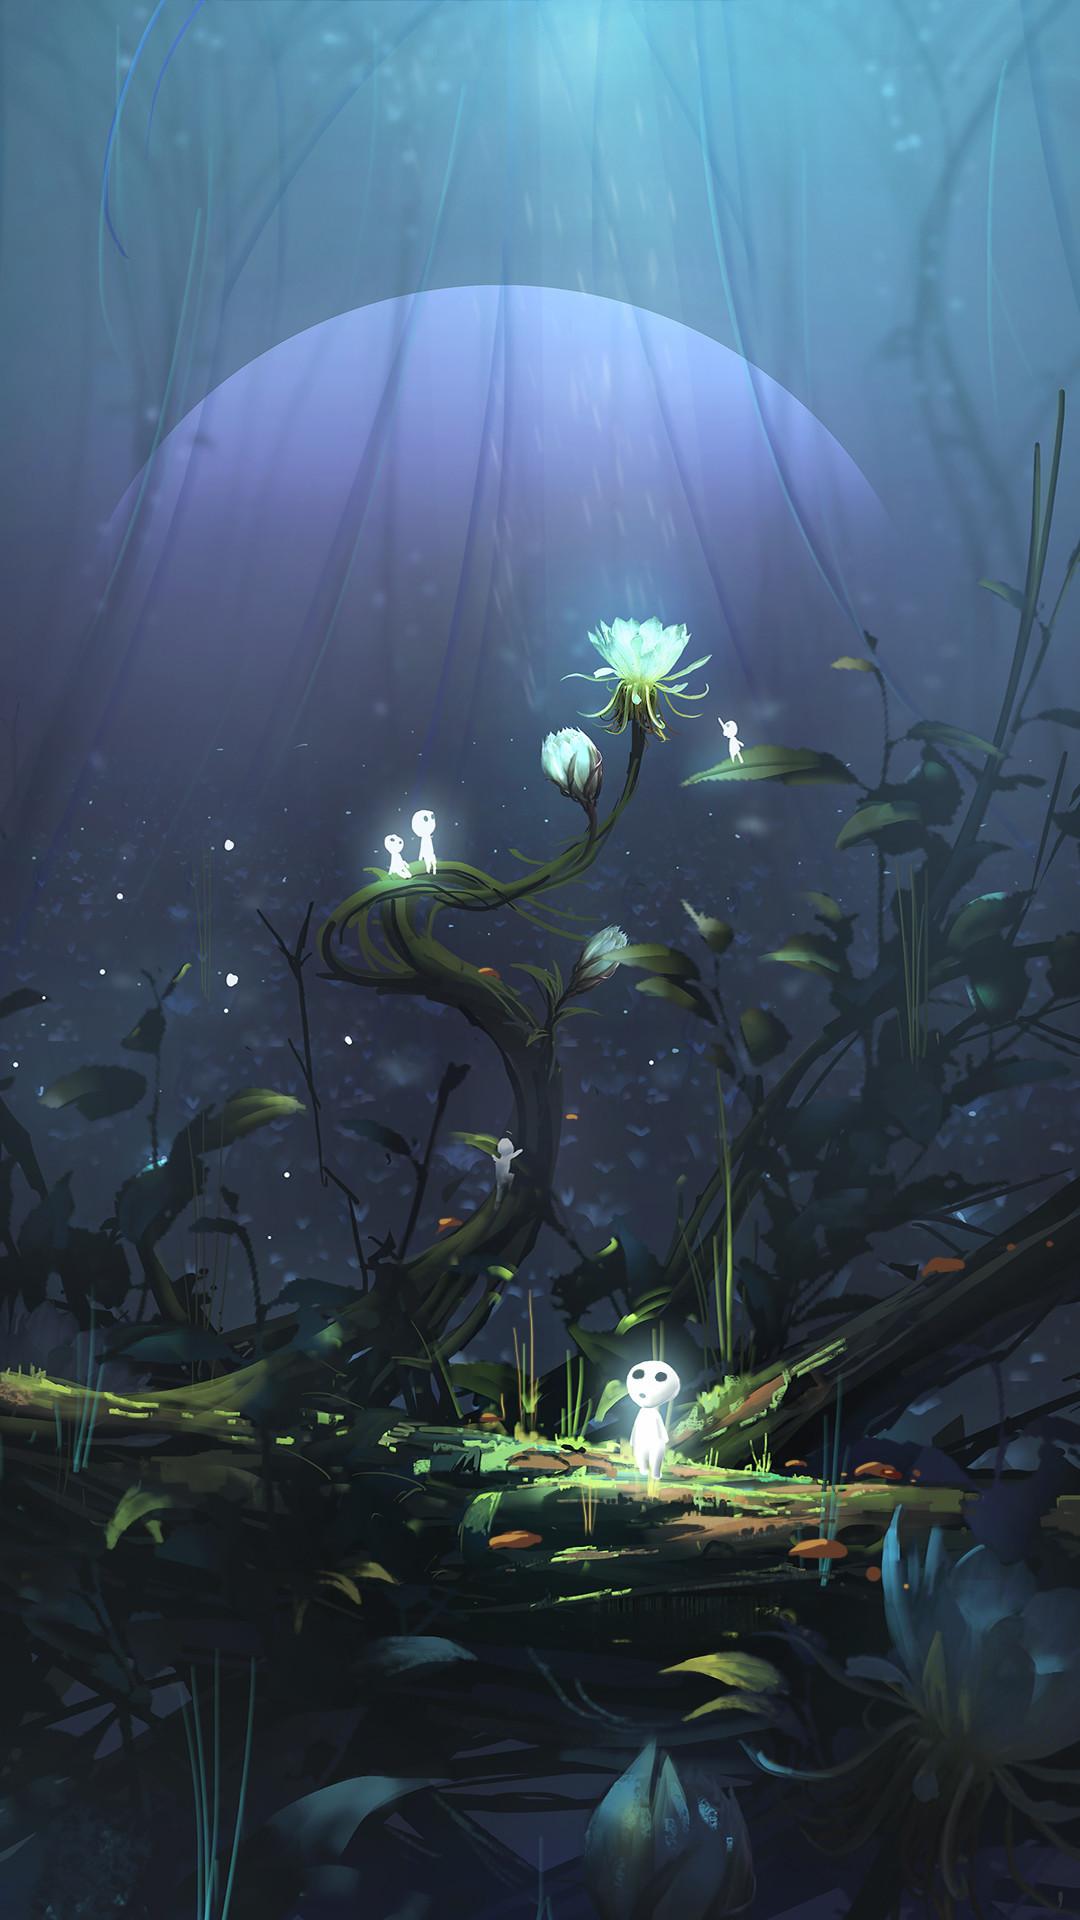 132 Princess Mononoke Wallpaper Hd